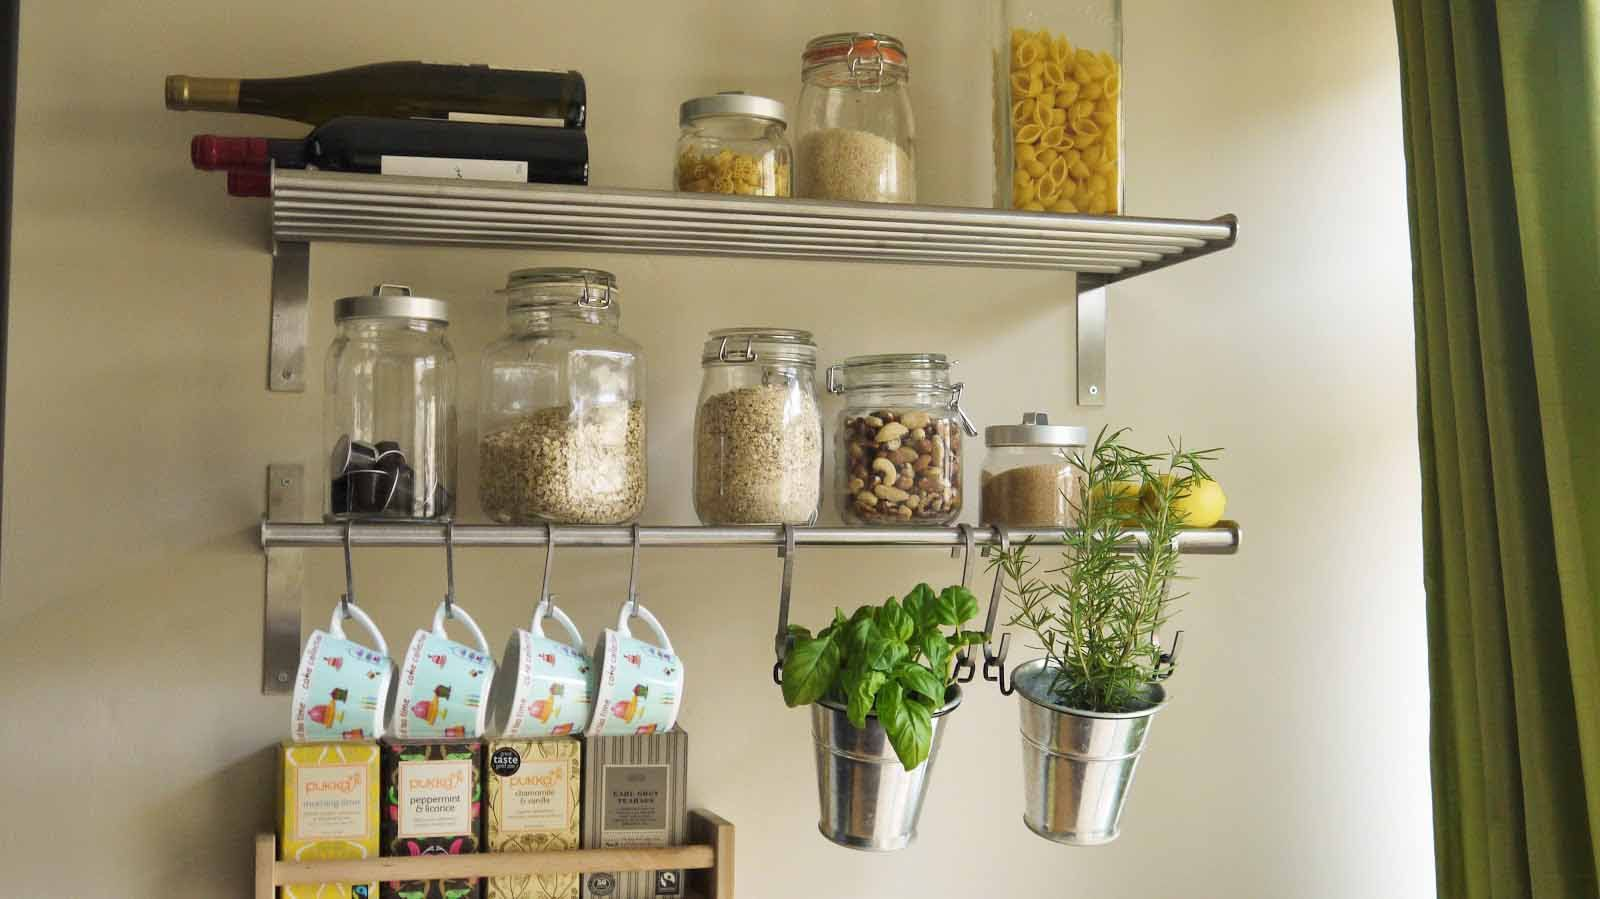 Kitchen Storage Ideas Shelves Jars Racks And Organizers Wall